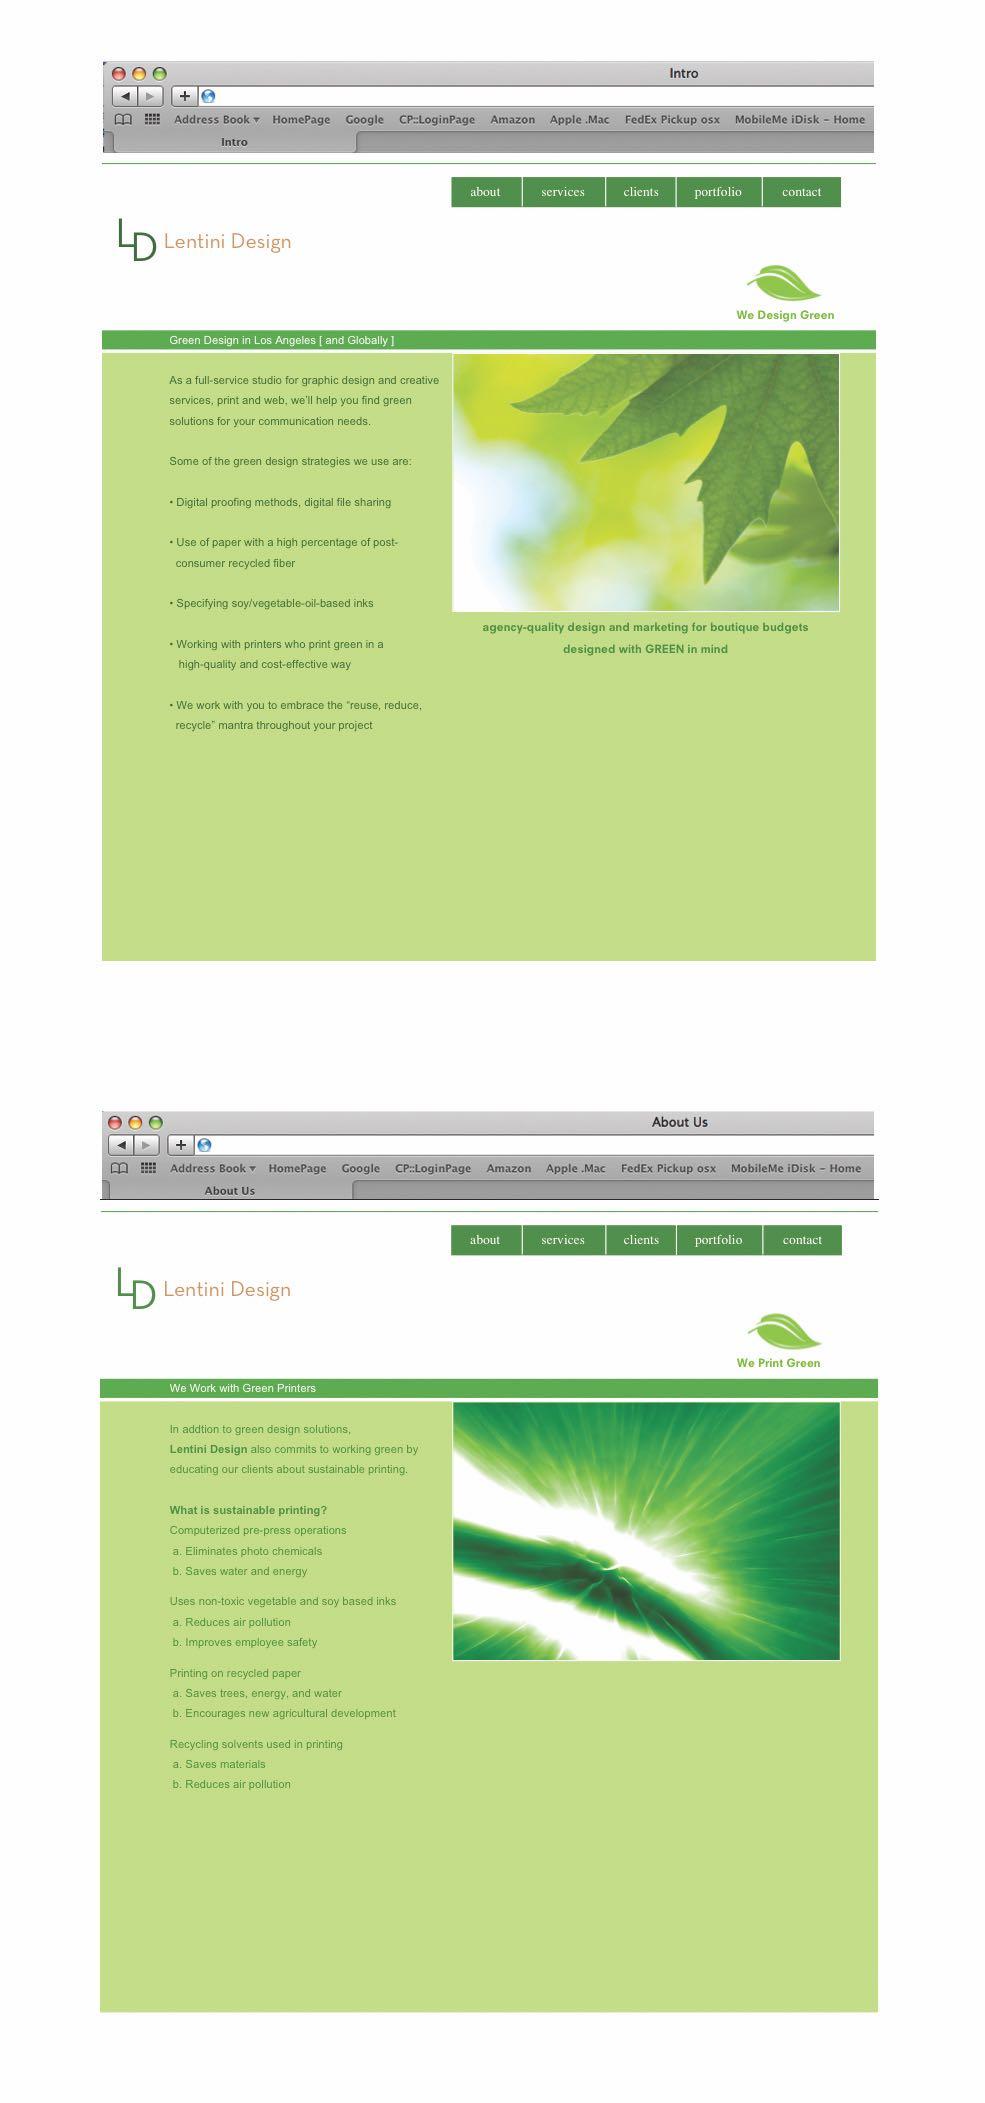 LD_WeDesignGreen_Website